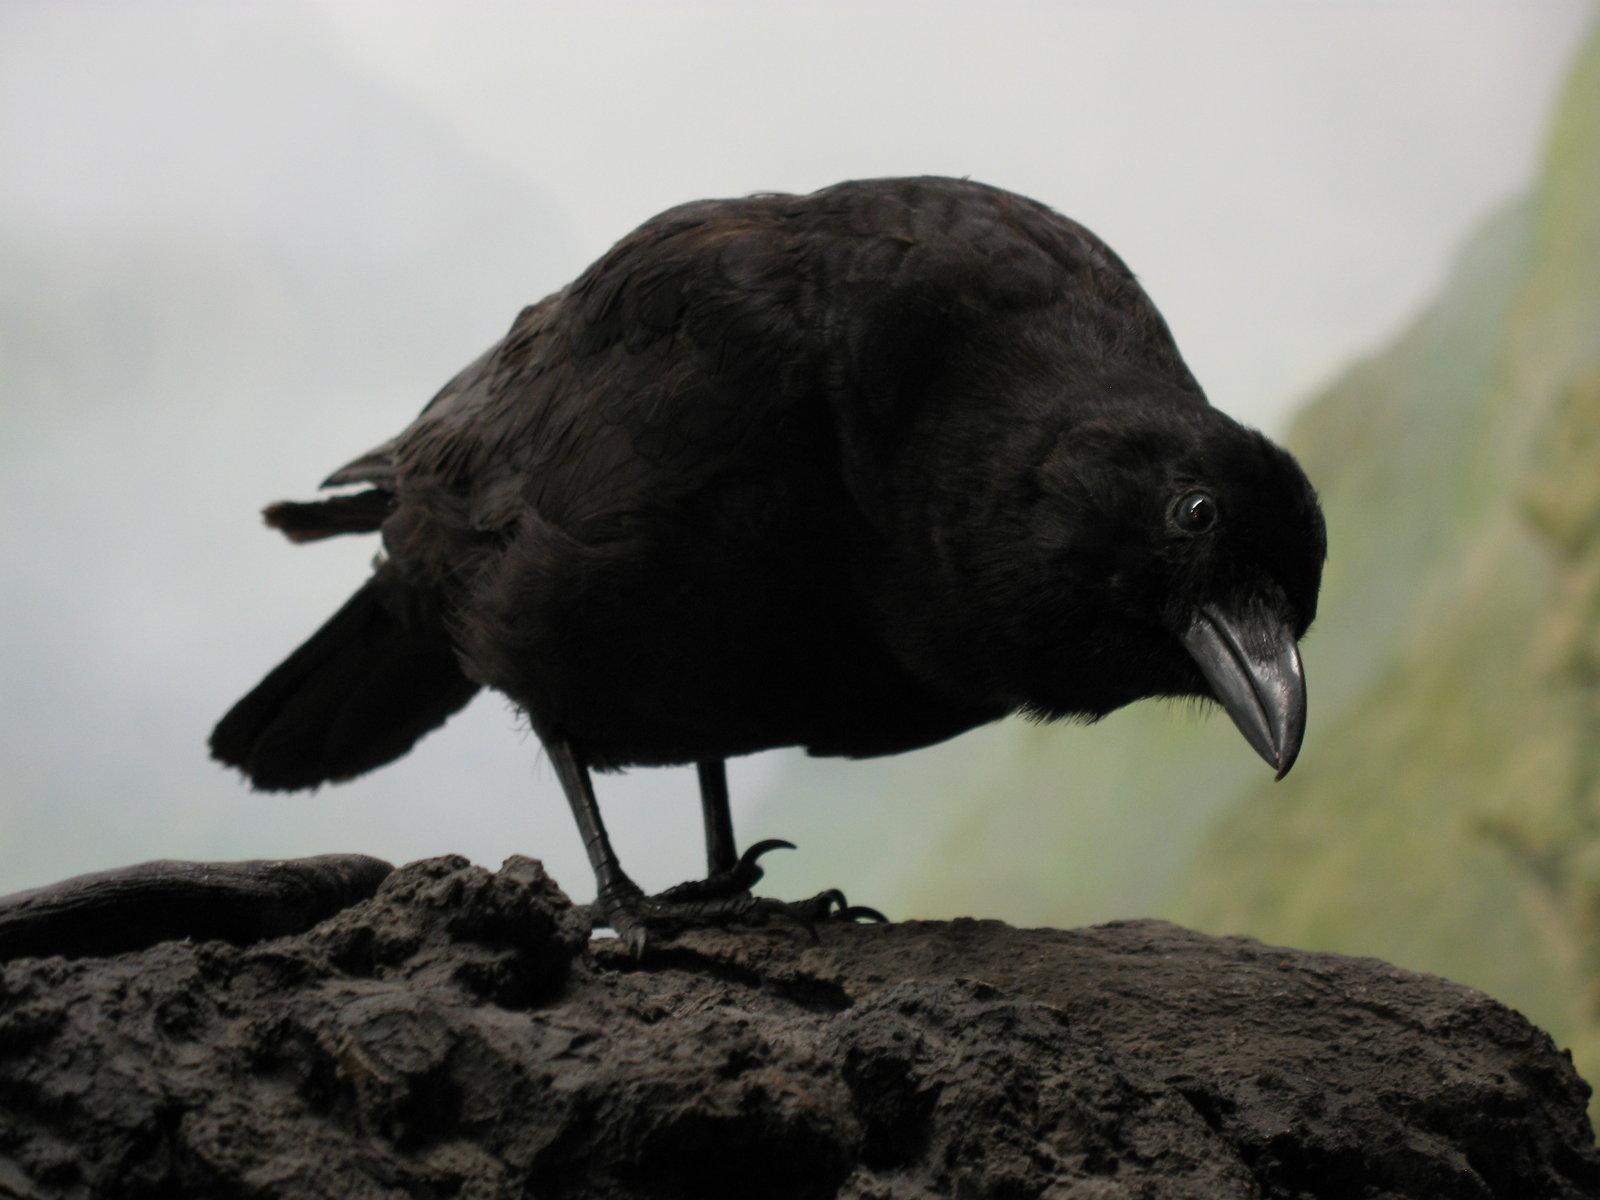 Curious Crow by solarka-stock